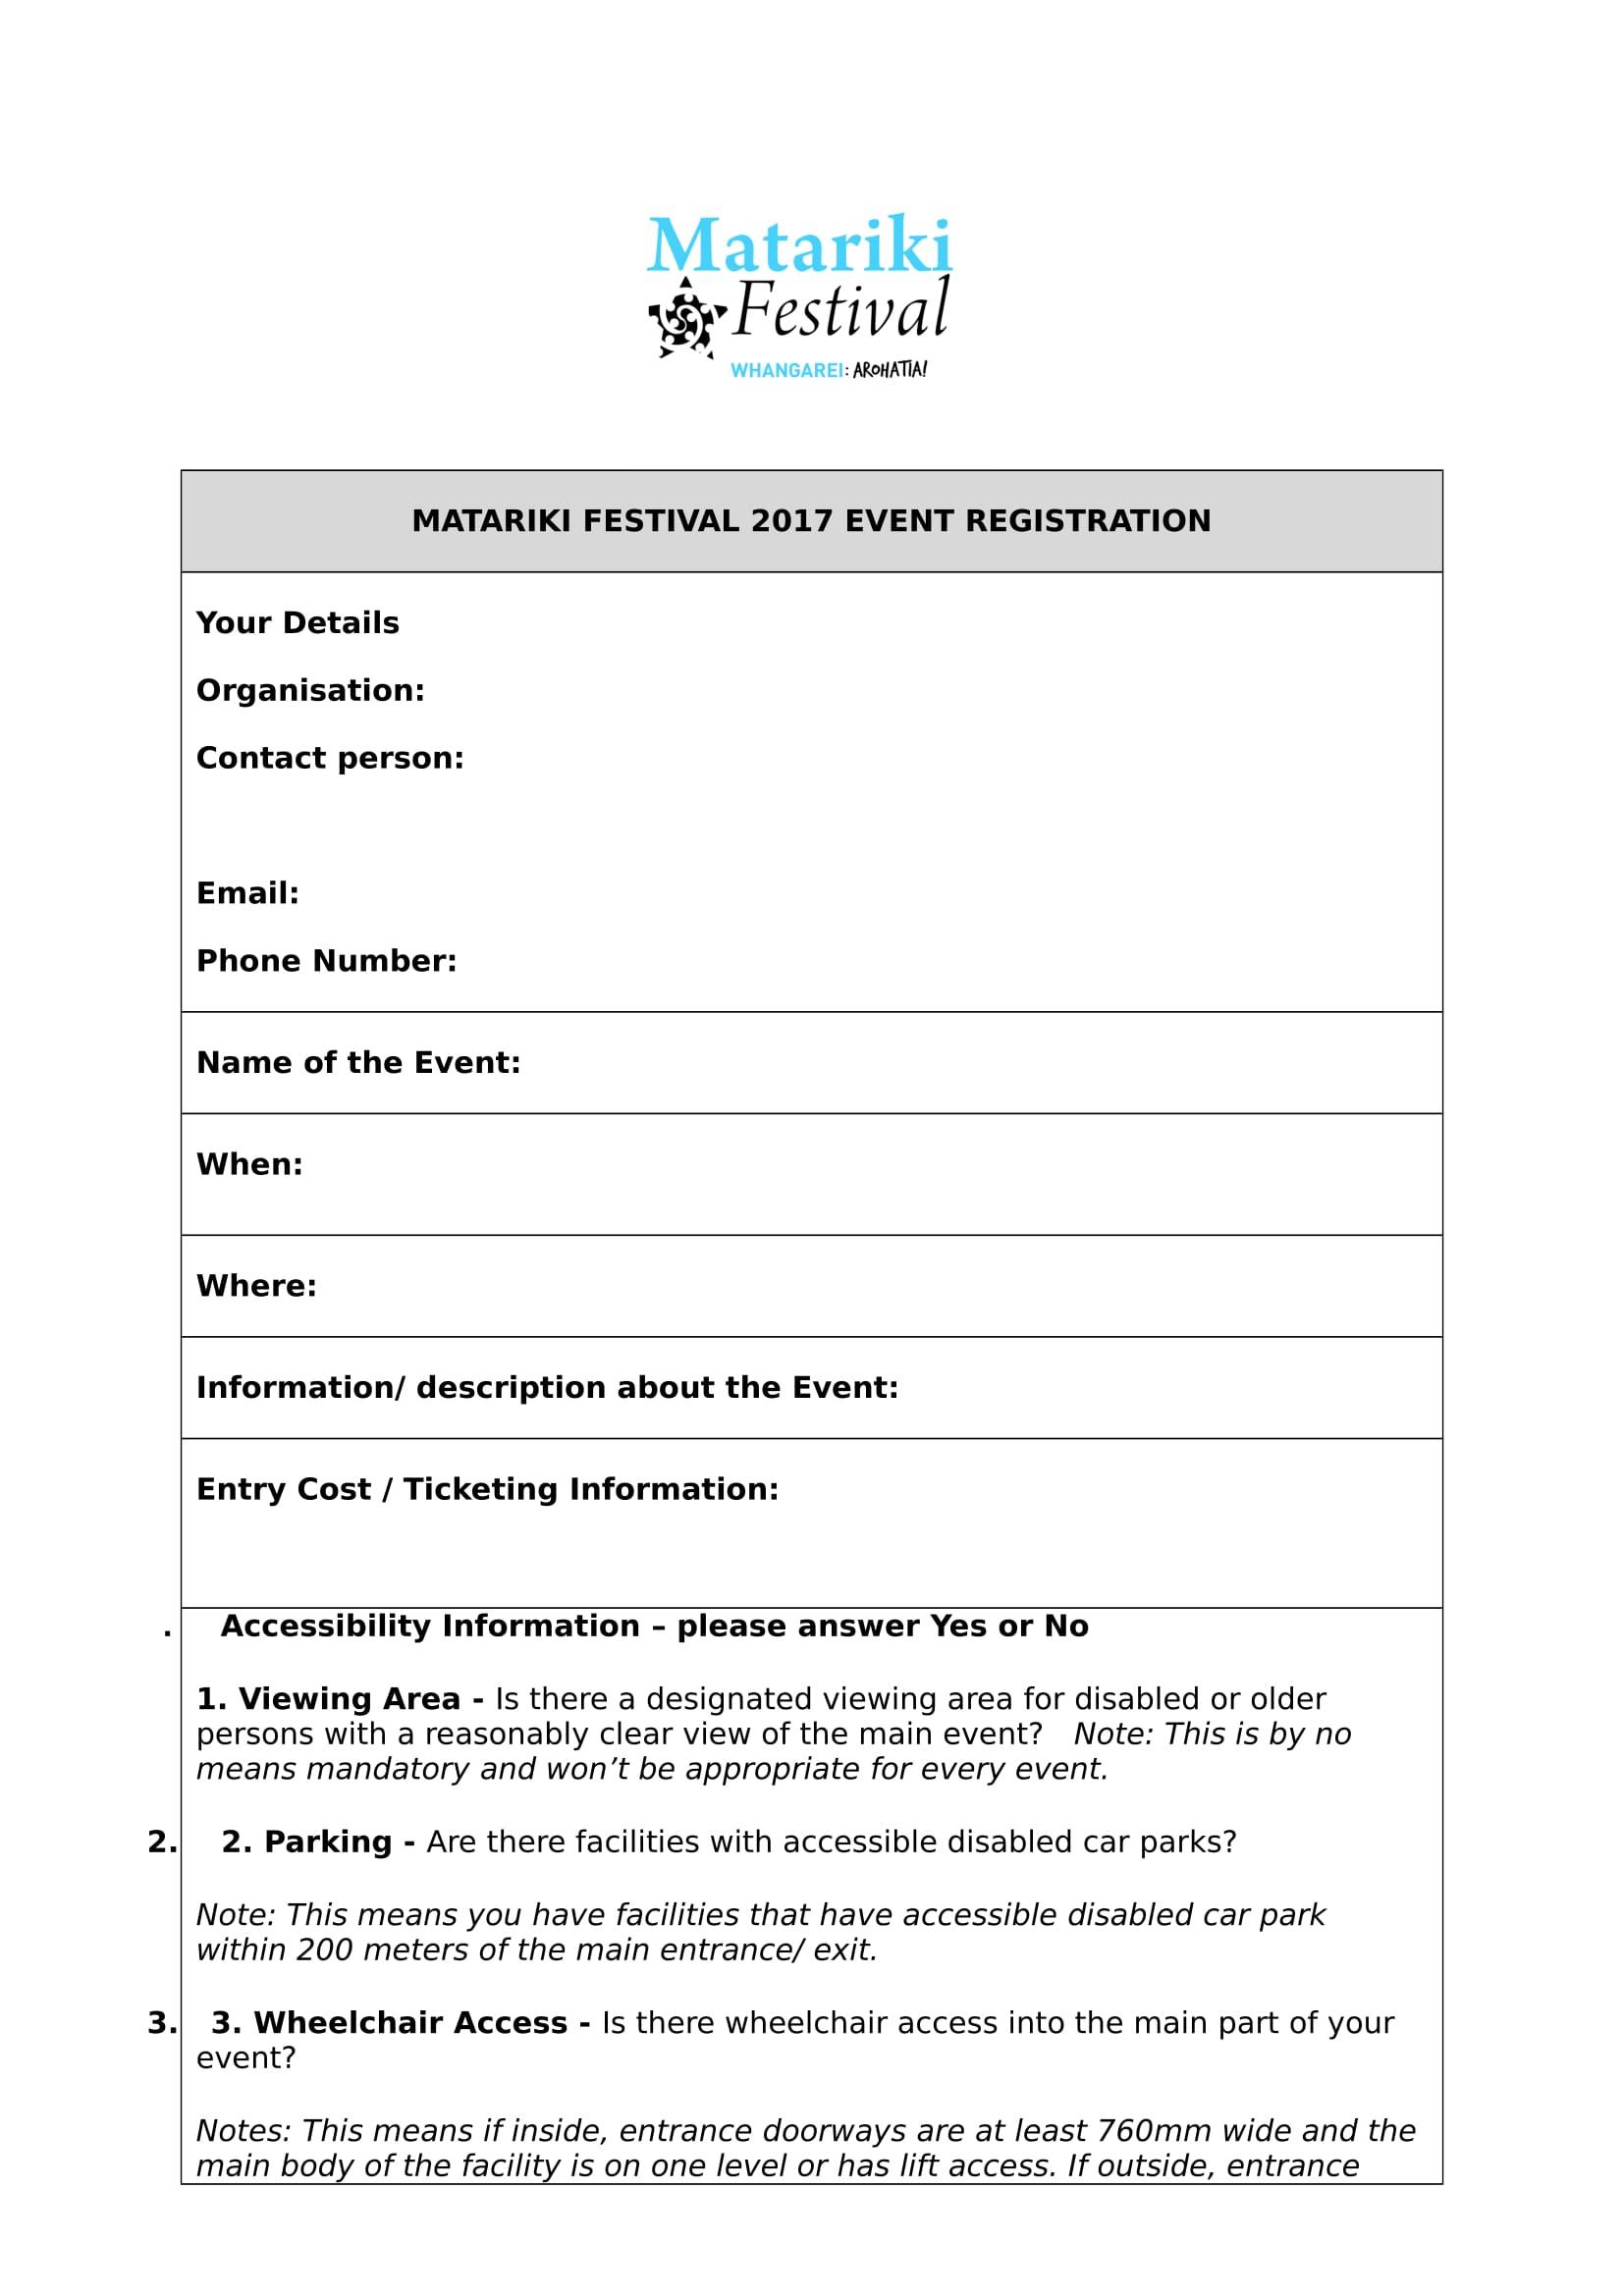 festival event registration form 1